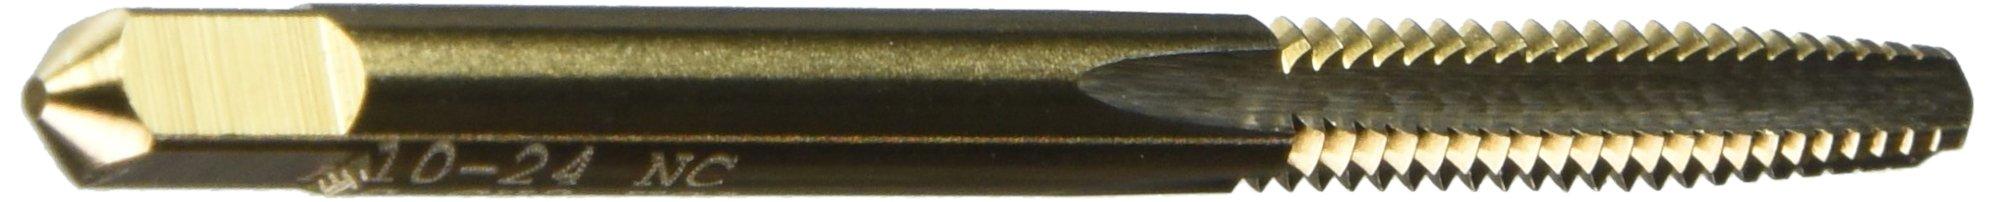 Triumph Twist Drill 71045 10-24 NC T62HDT High Speed Steel Taper Tap Thundertap Bronze Oxide Coated